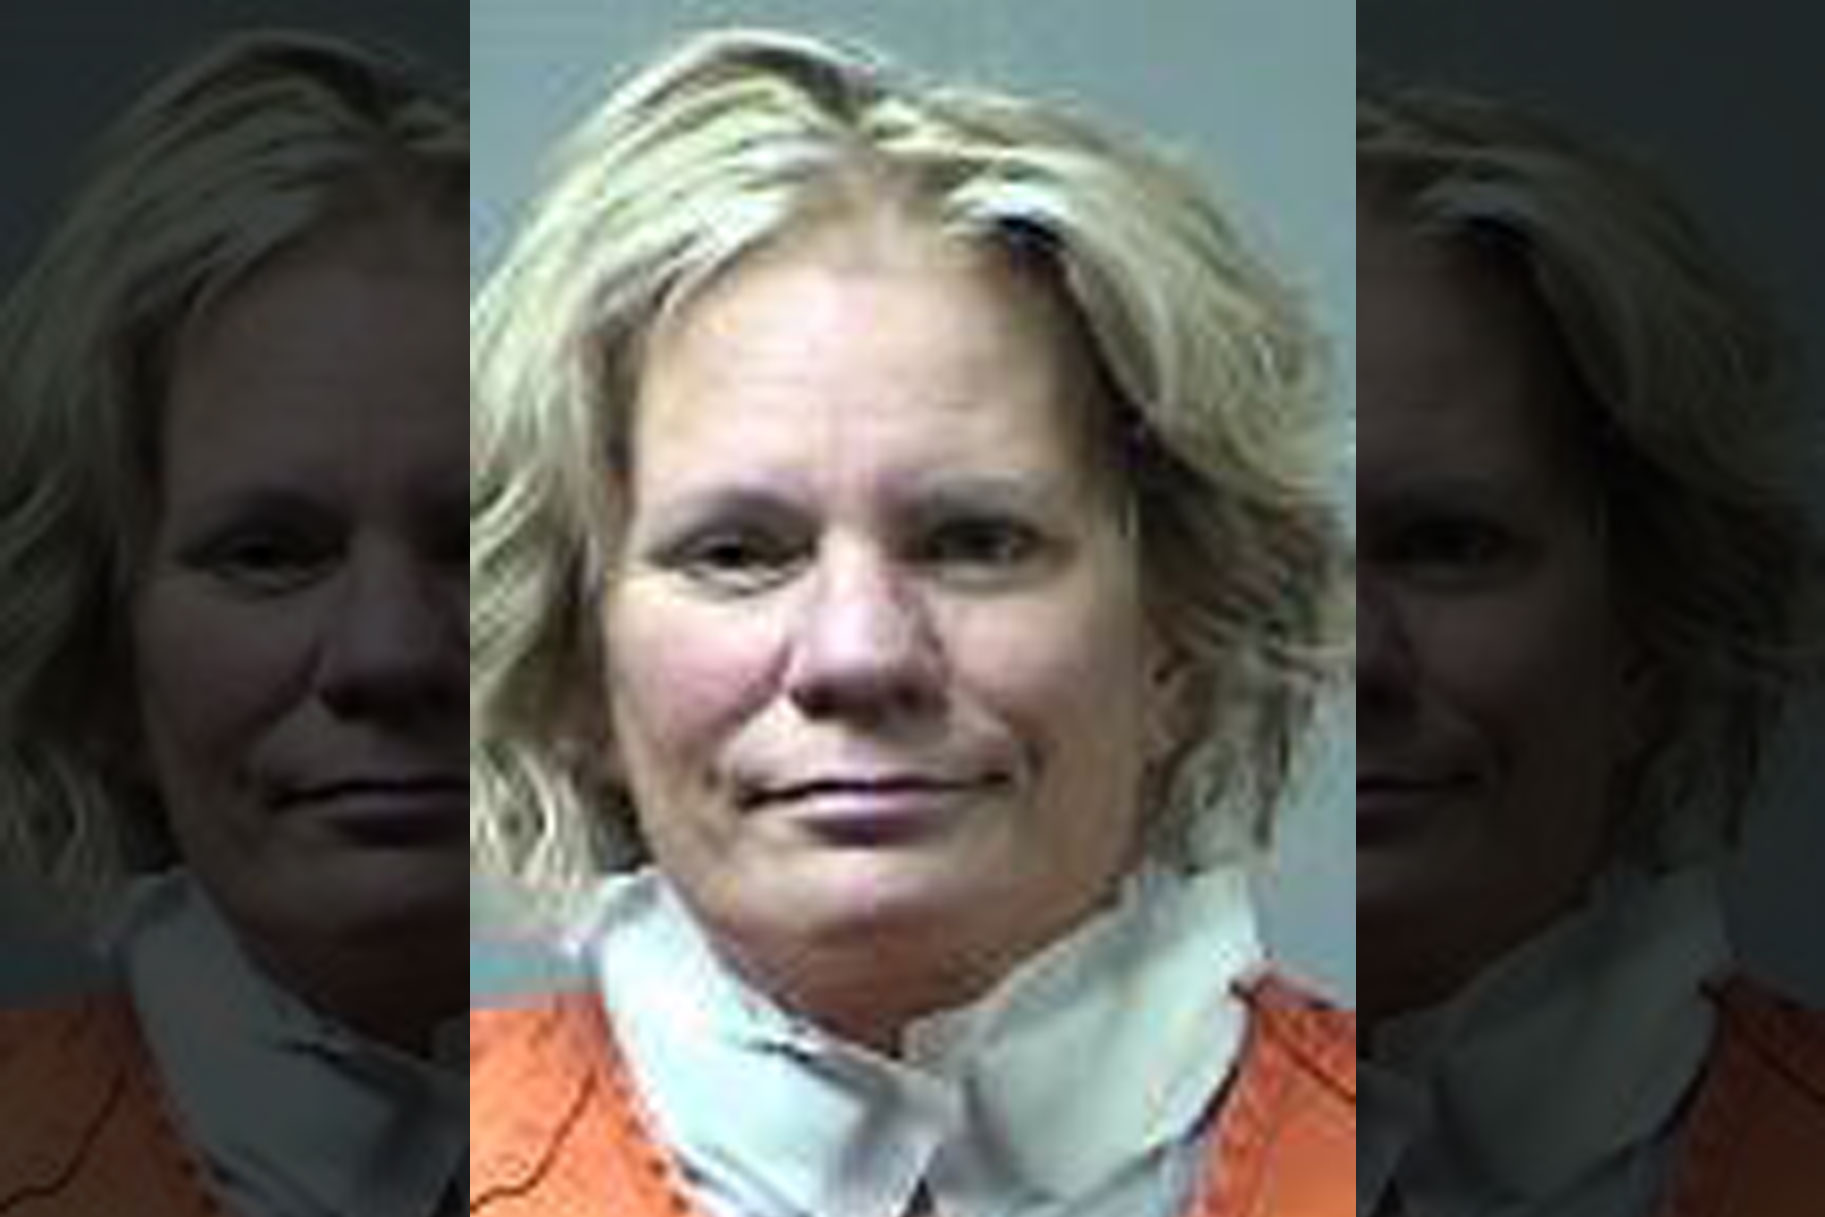 Pamela Hupp Takes Alford Plea In Death Of Louis Gumpenberger | Crime